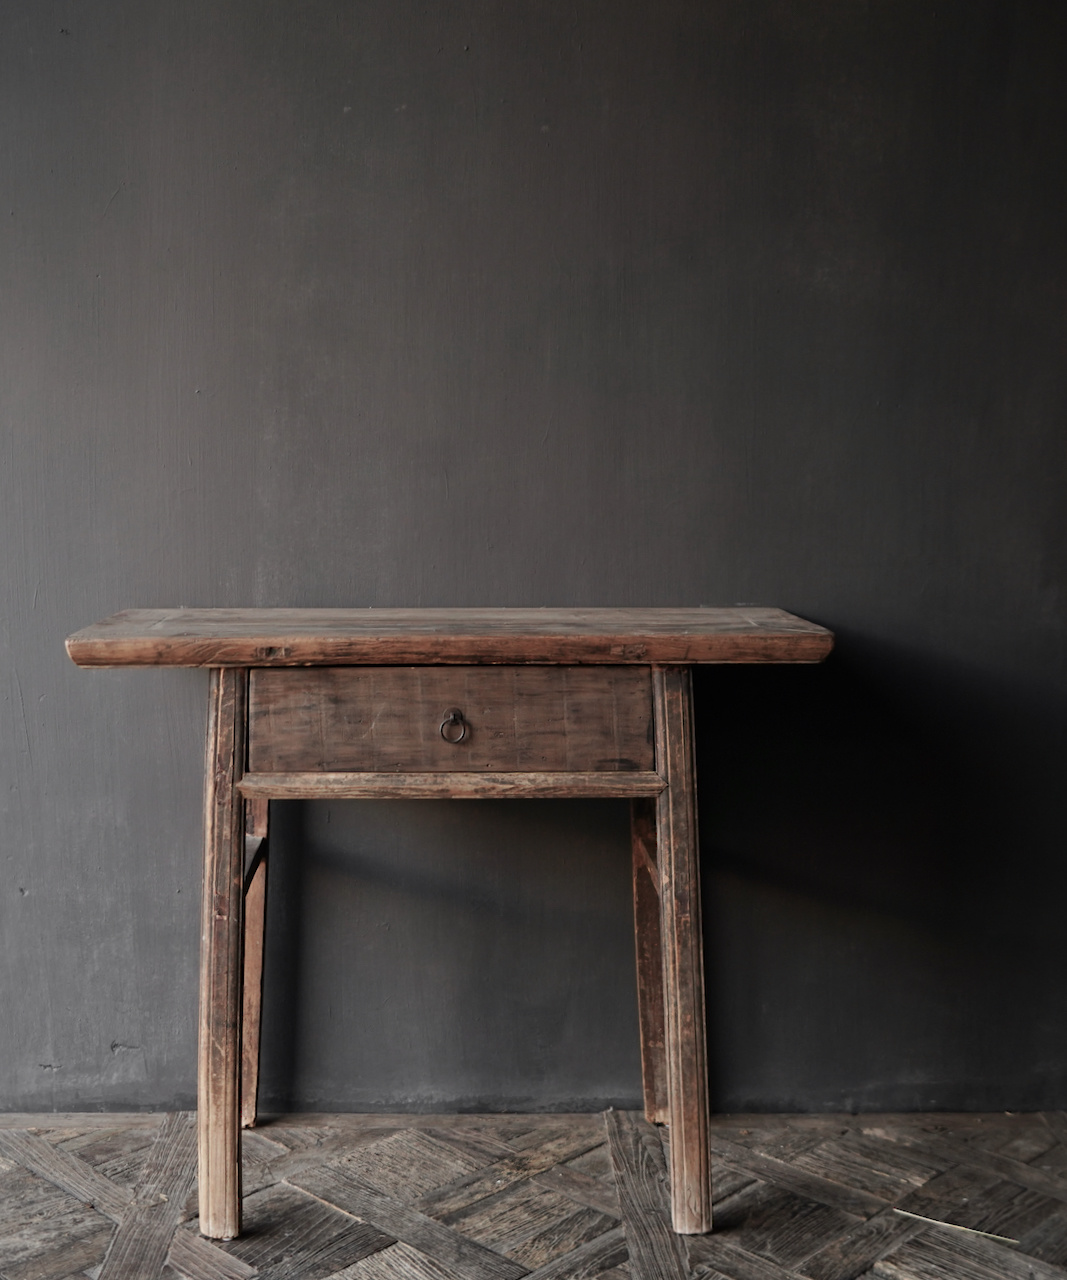 Authentieke Sidetable oftewel muurtafel met een lade-3